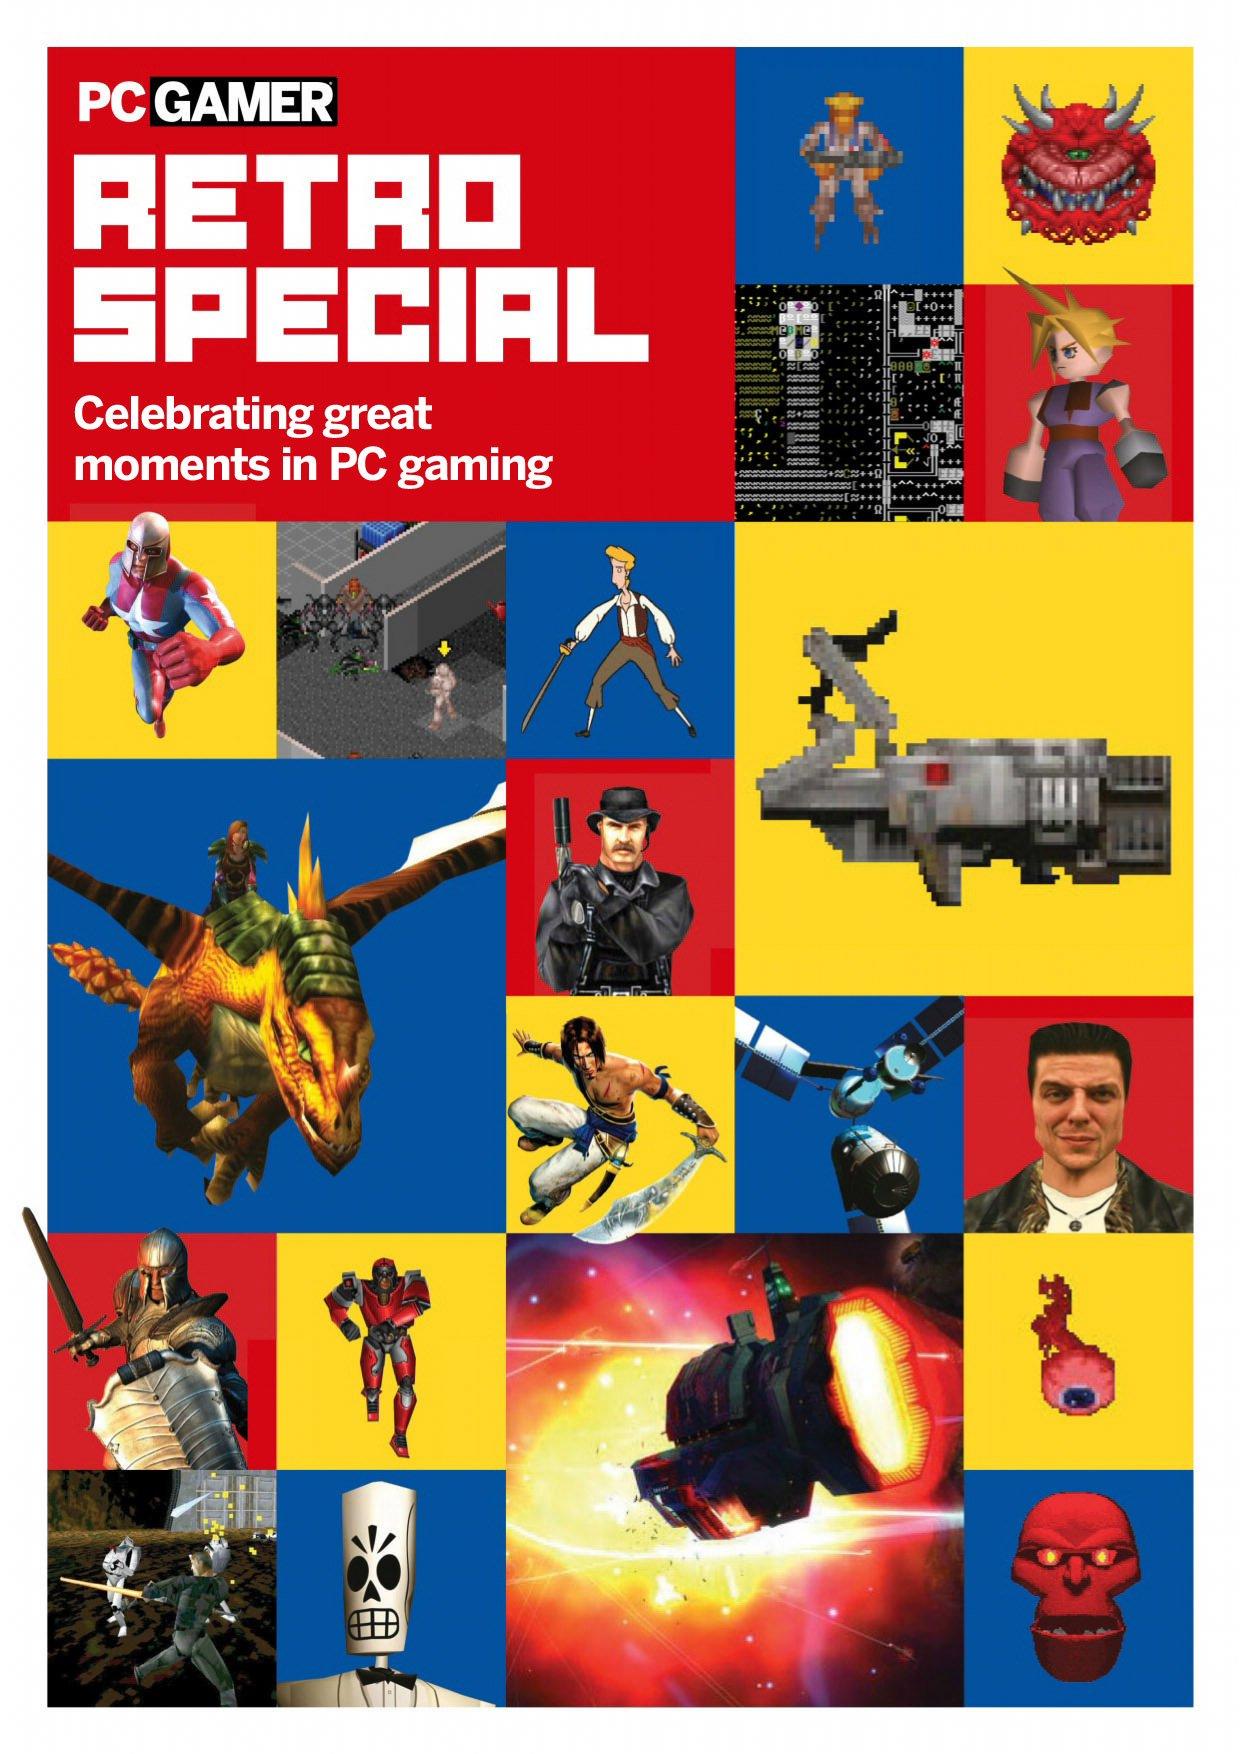 PC Gamer Retro Special